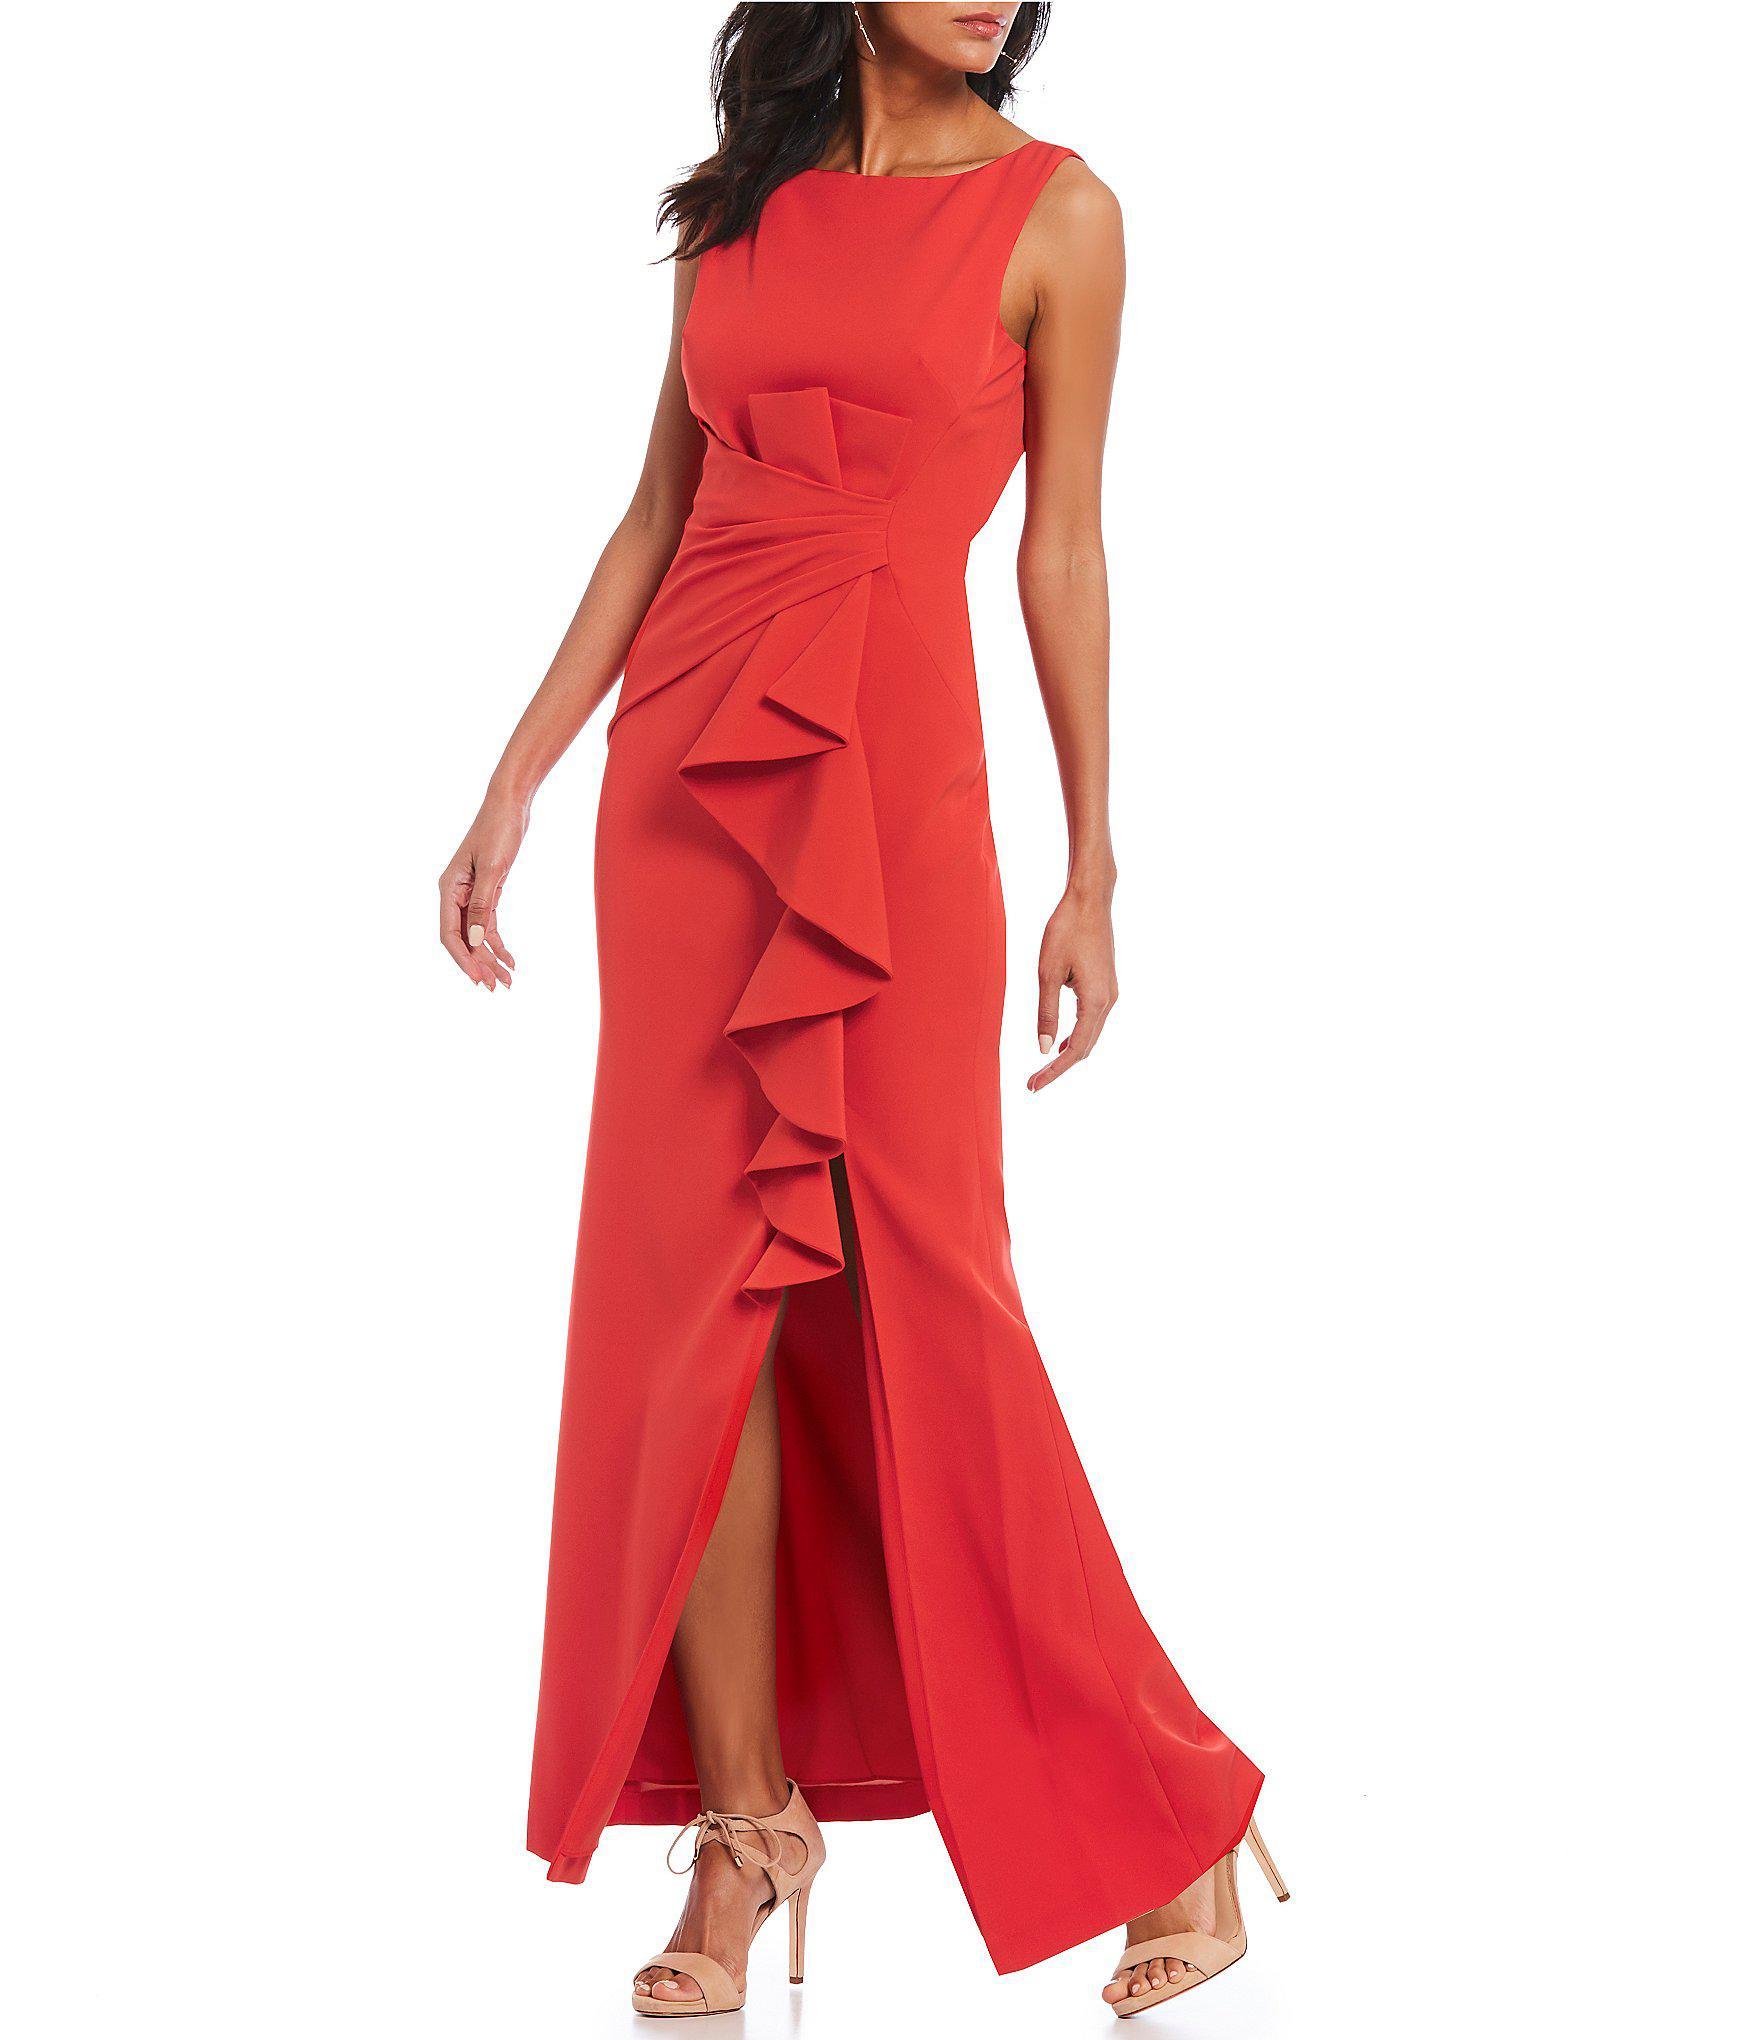 1eddfe53844 Eliza J Ruffle Front Slit Sheath Gown in Red - Lyst